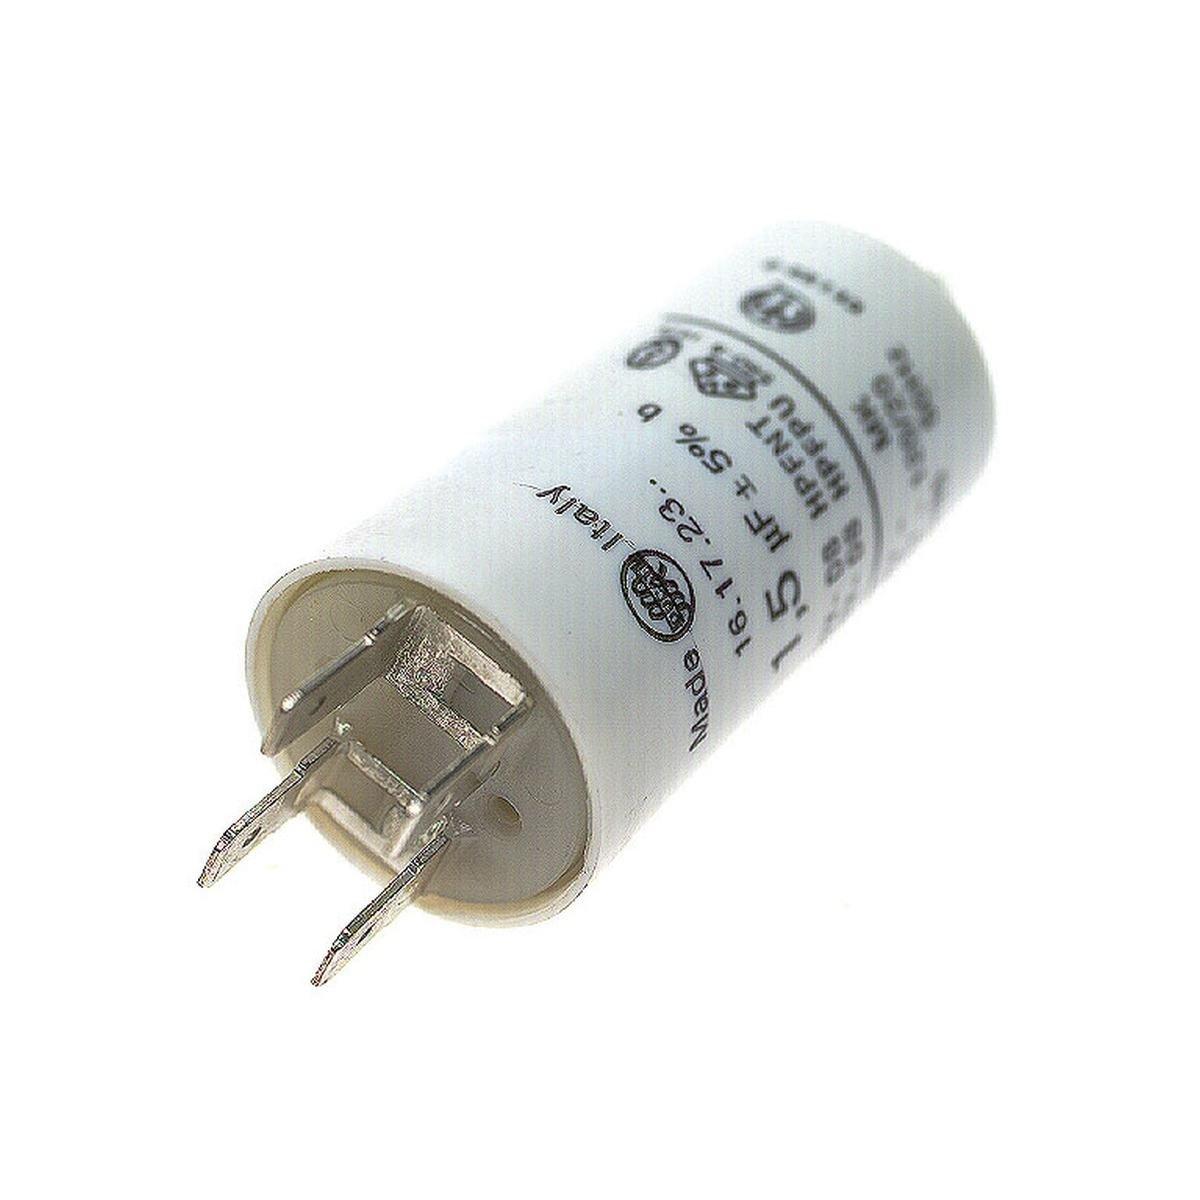 Kondensator 8,0 µF 450V